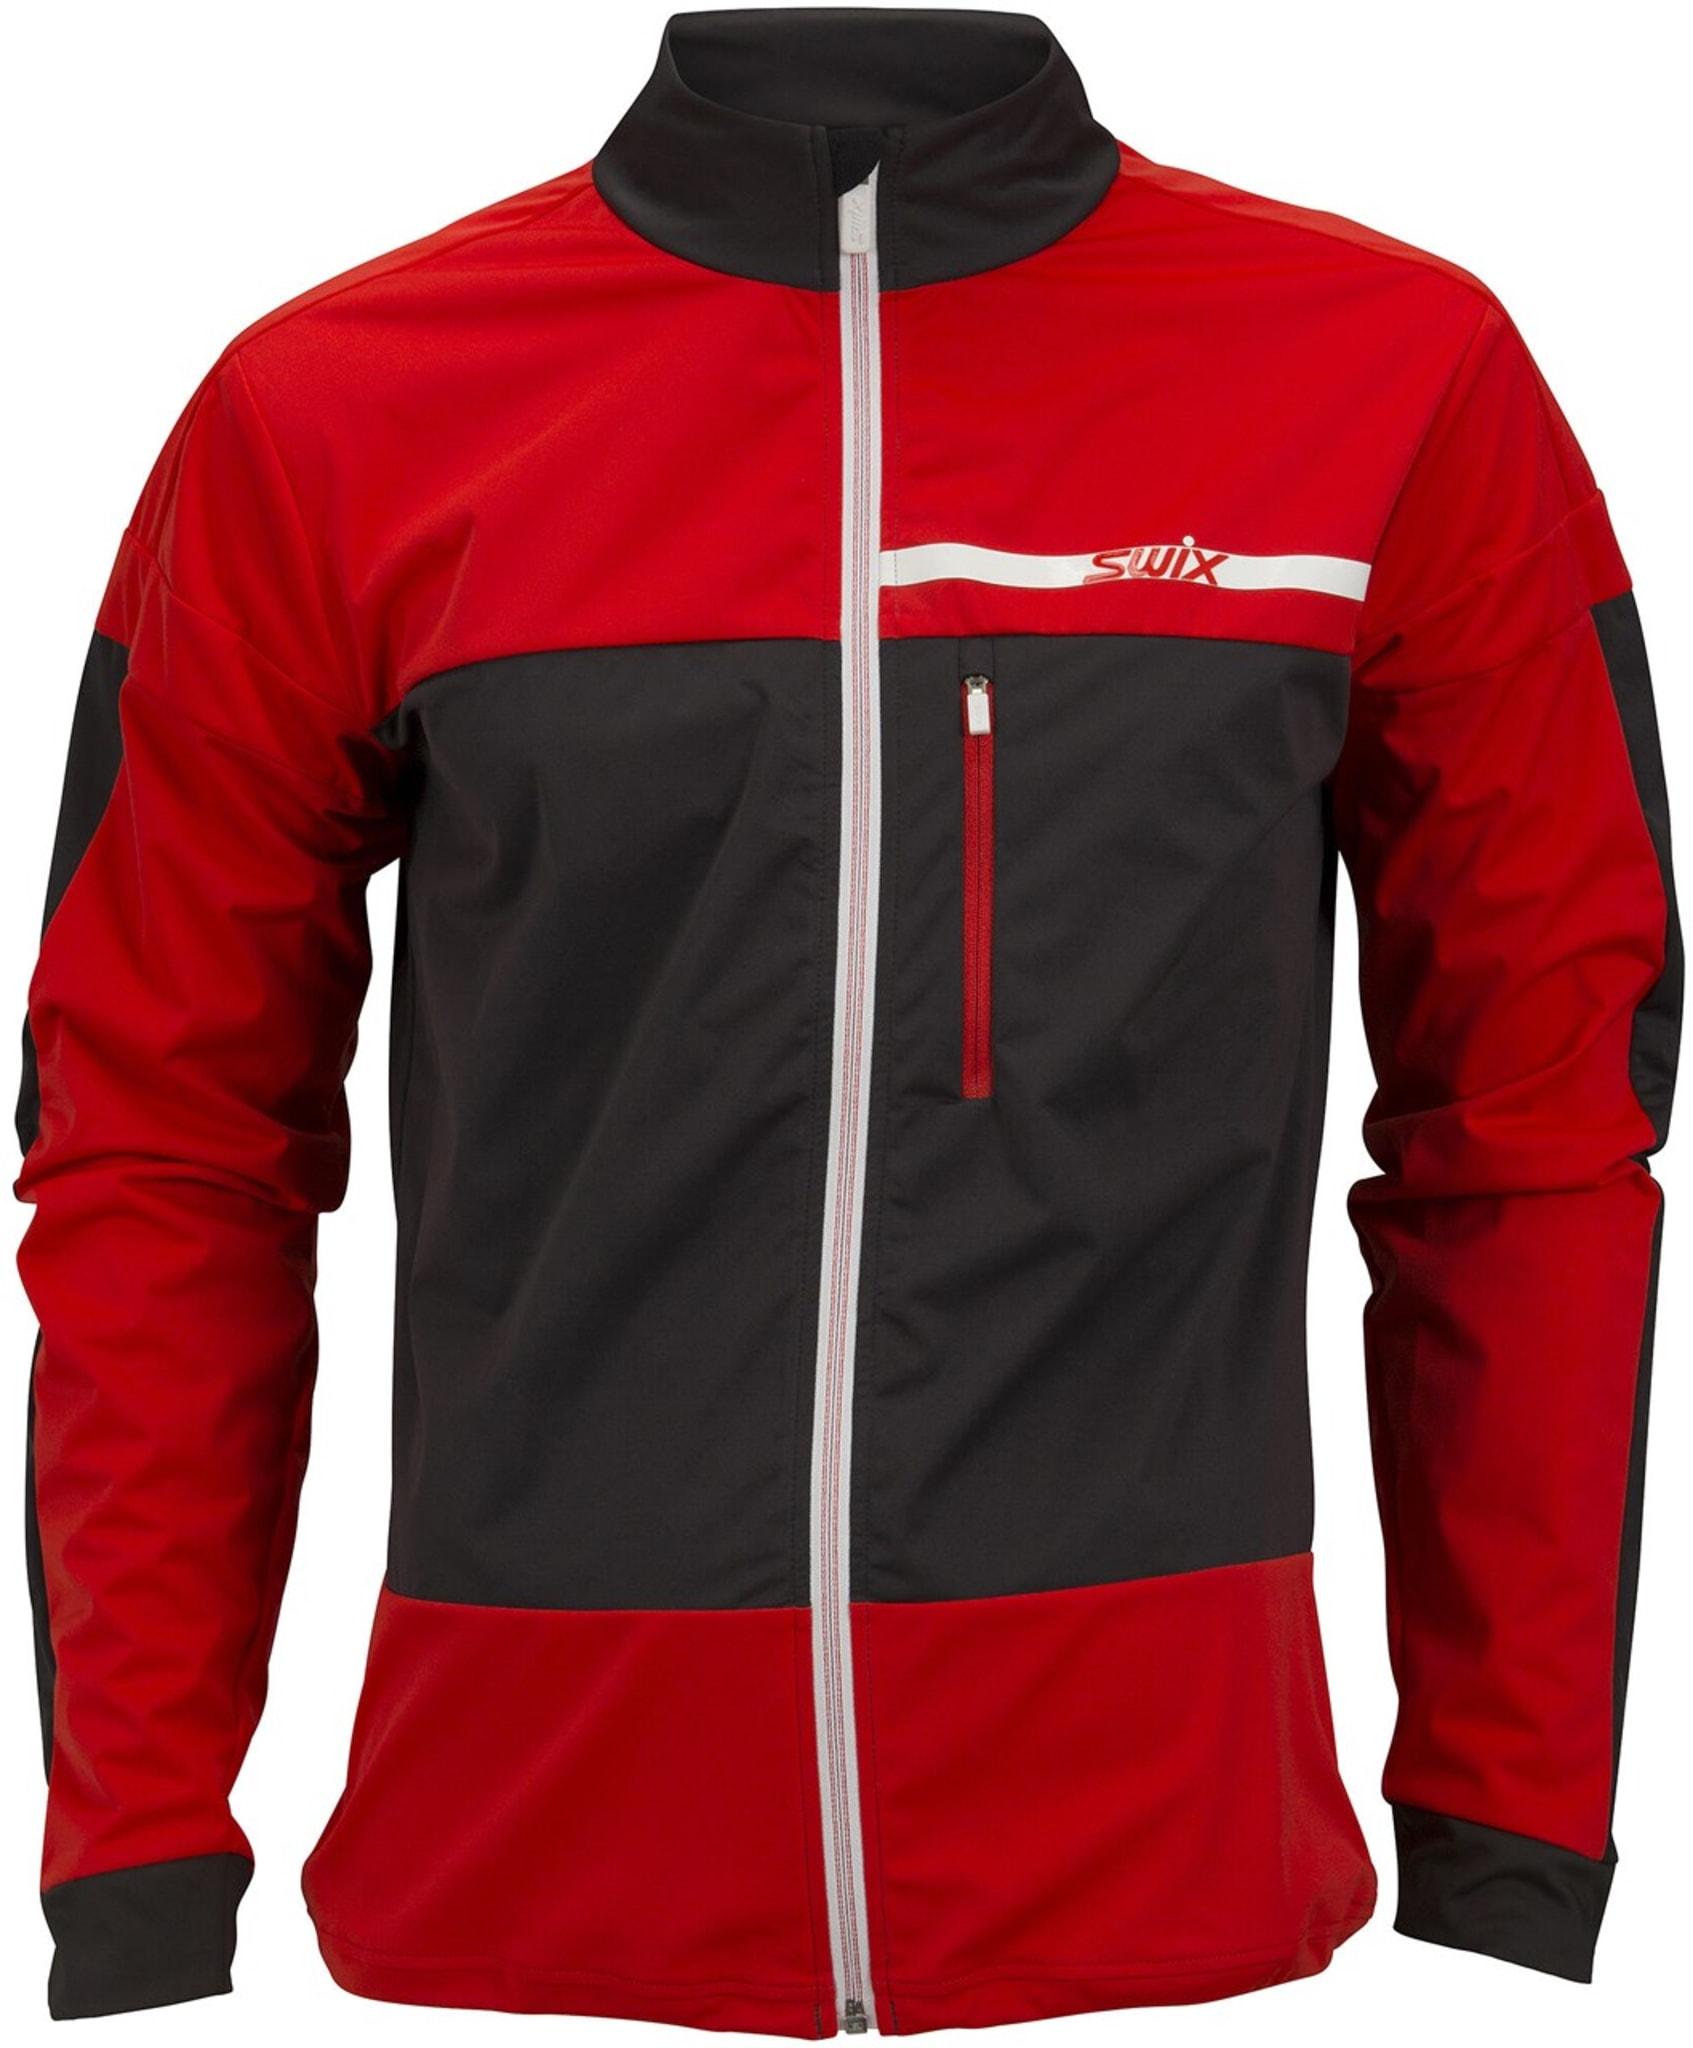 Carbon Light Softshell Jacket